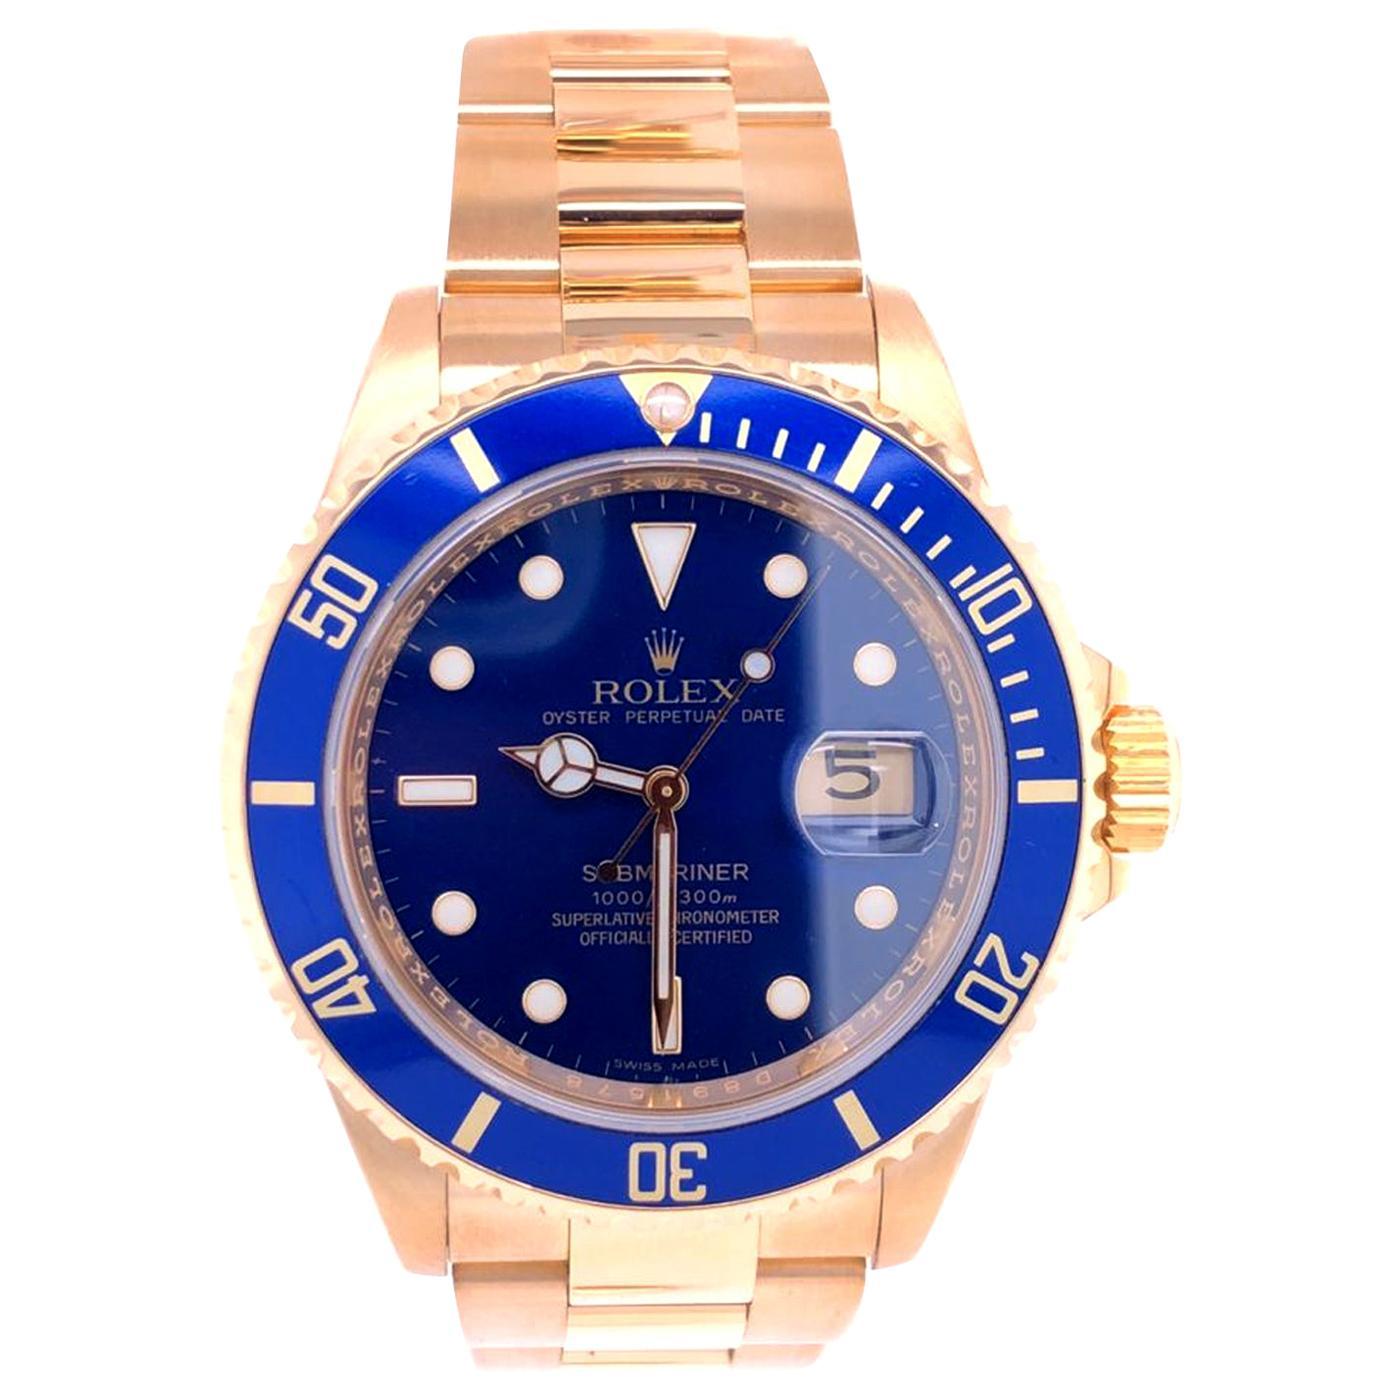 Rolex Submariner 16618 Oyster 18k Yellow Gold Blue Sunburst Dial Men's Watch